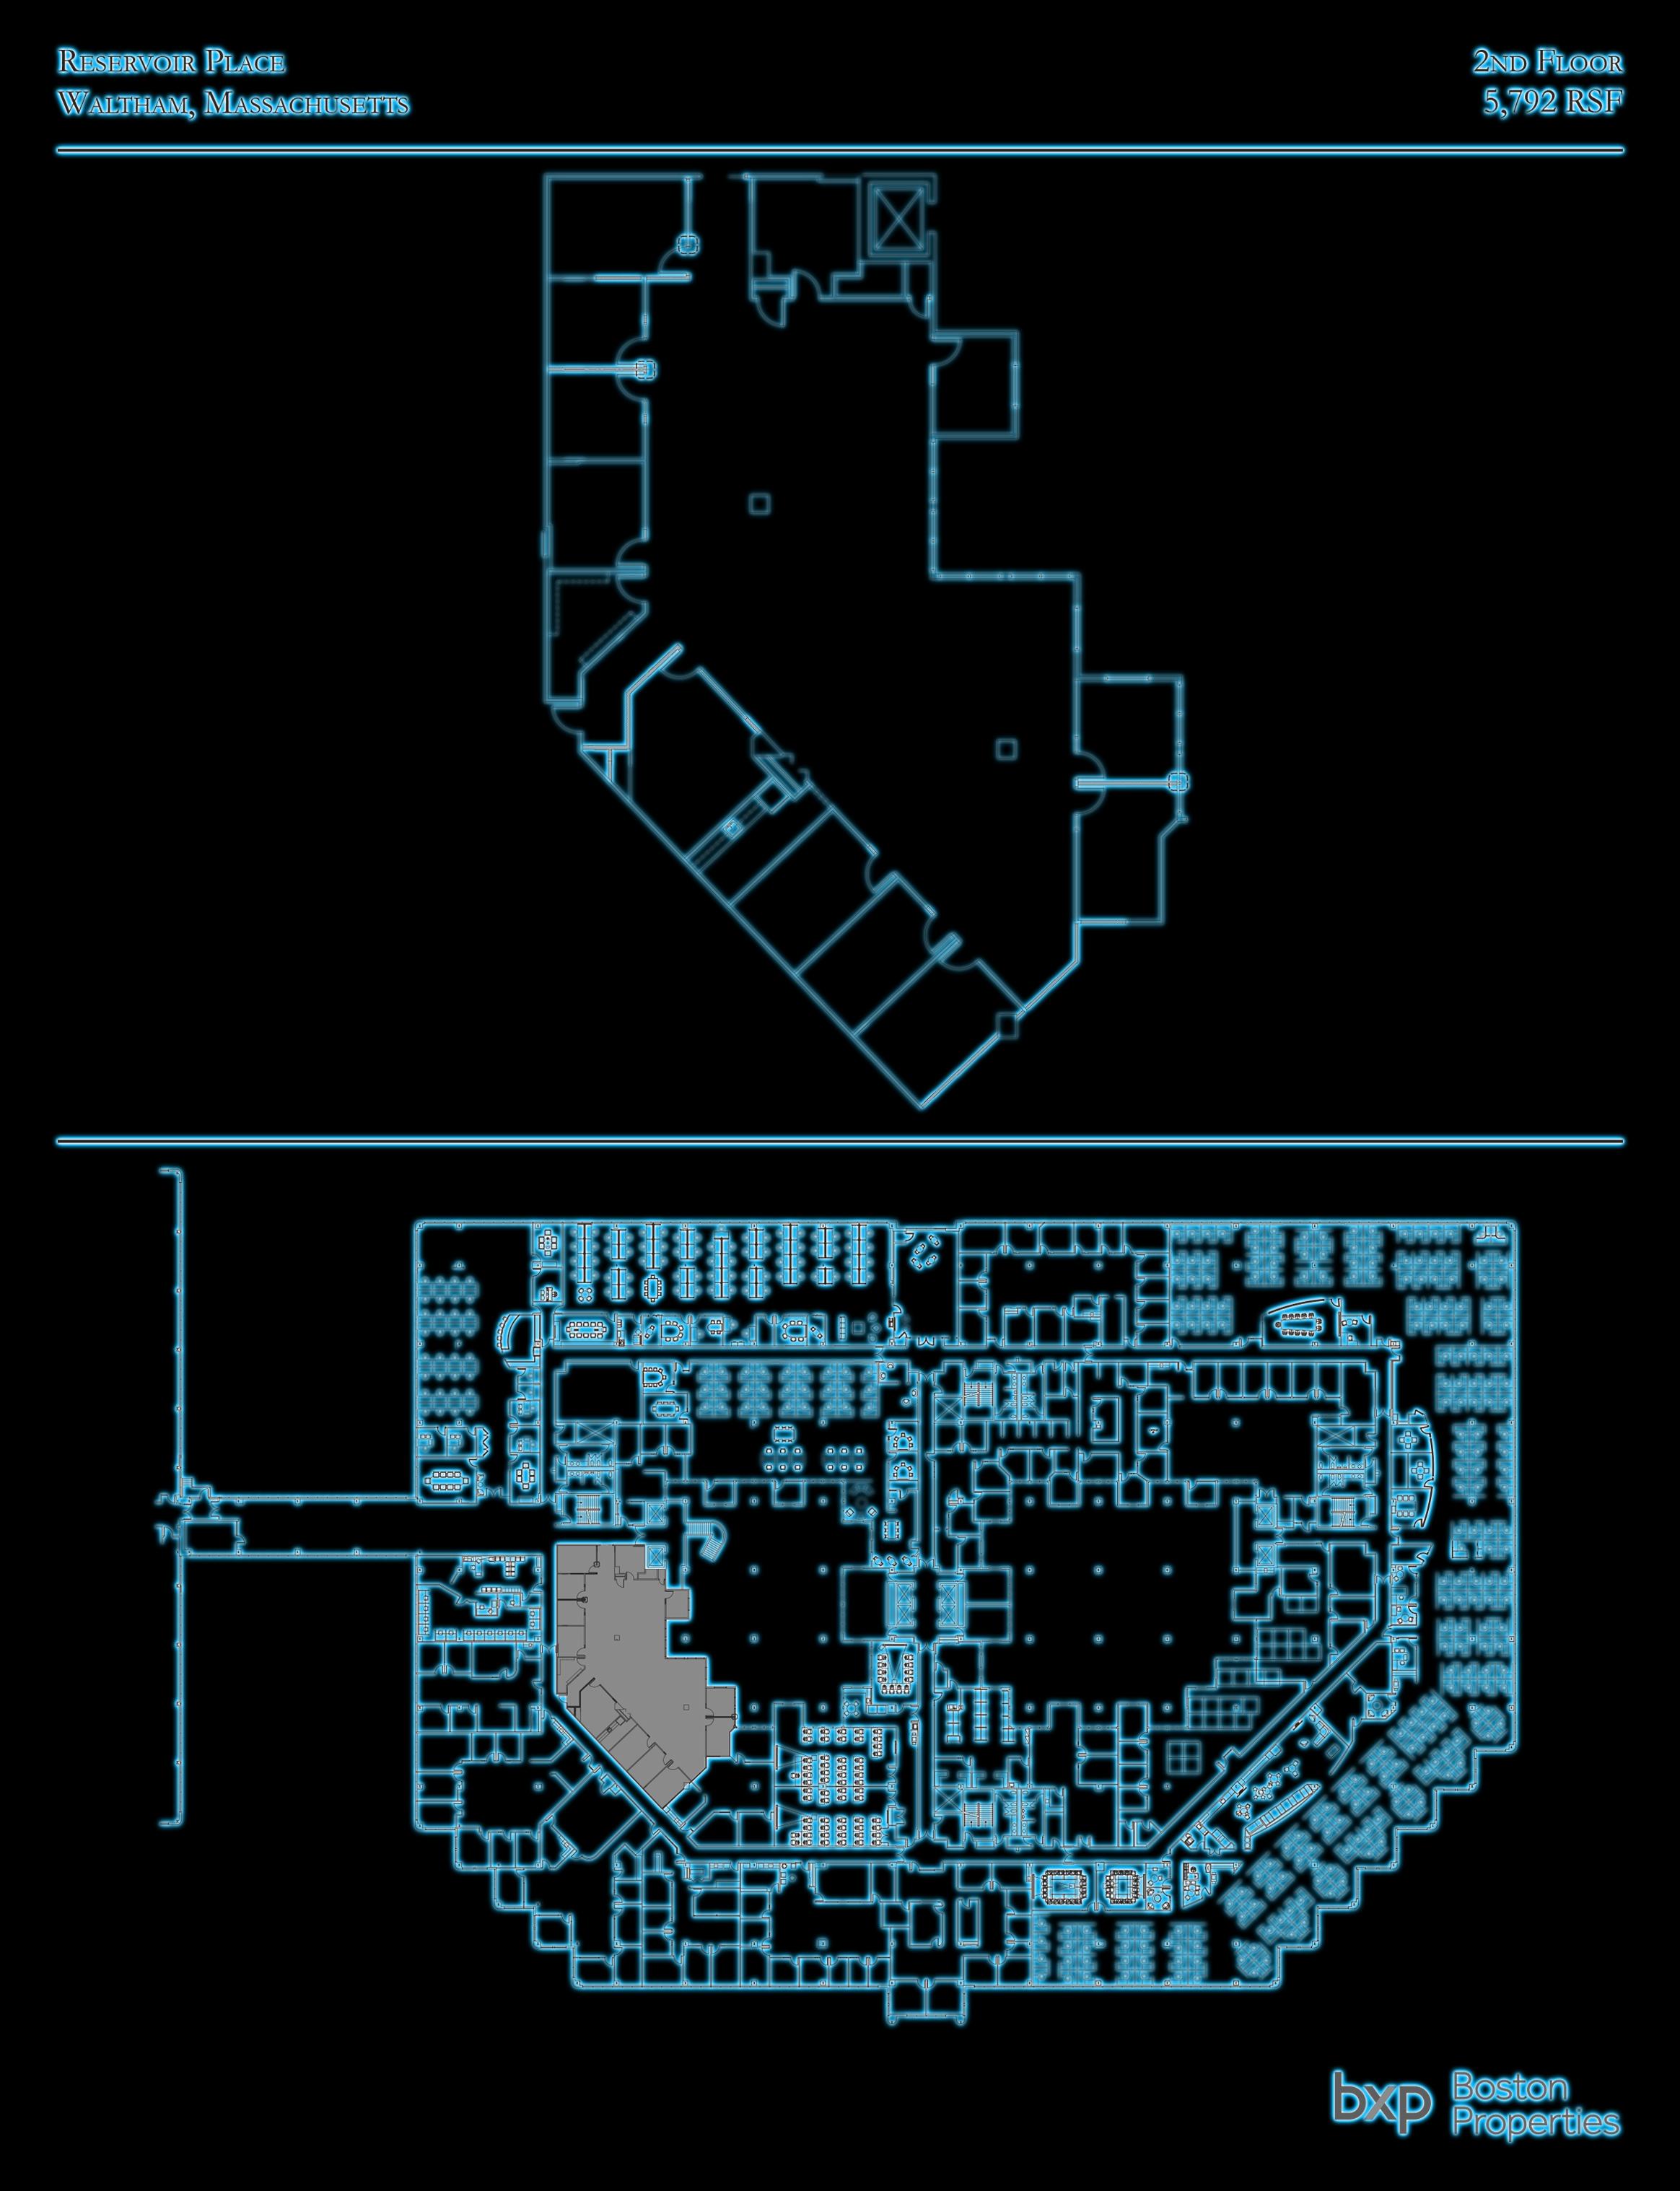 Reservoir Place - 5,792 SF